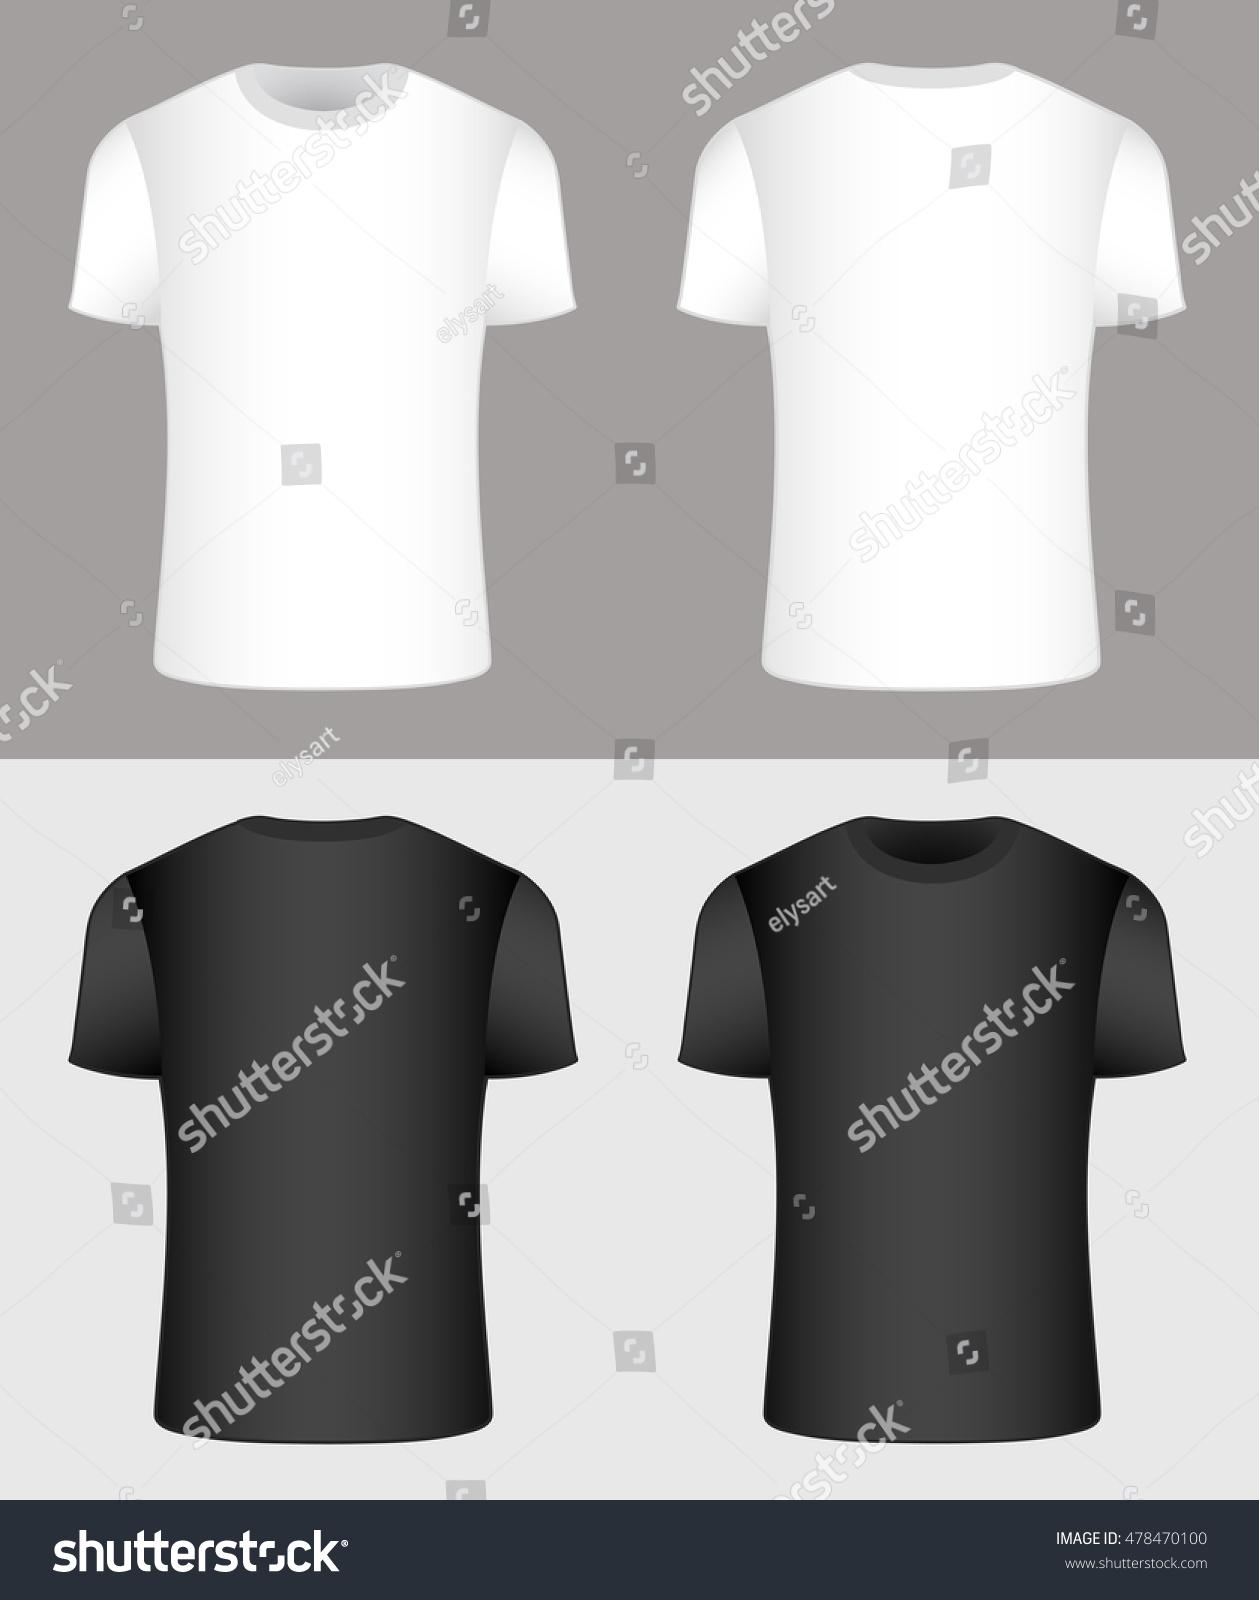 Black t shirt vector - T Shirt Black And White Vector